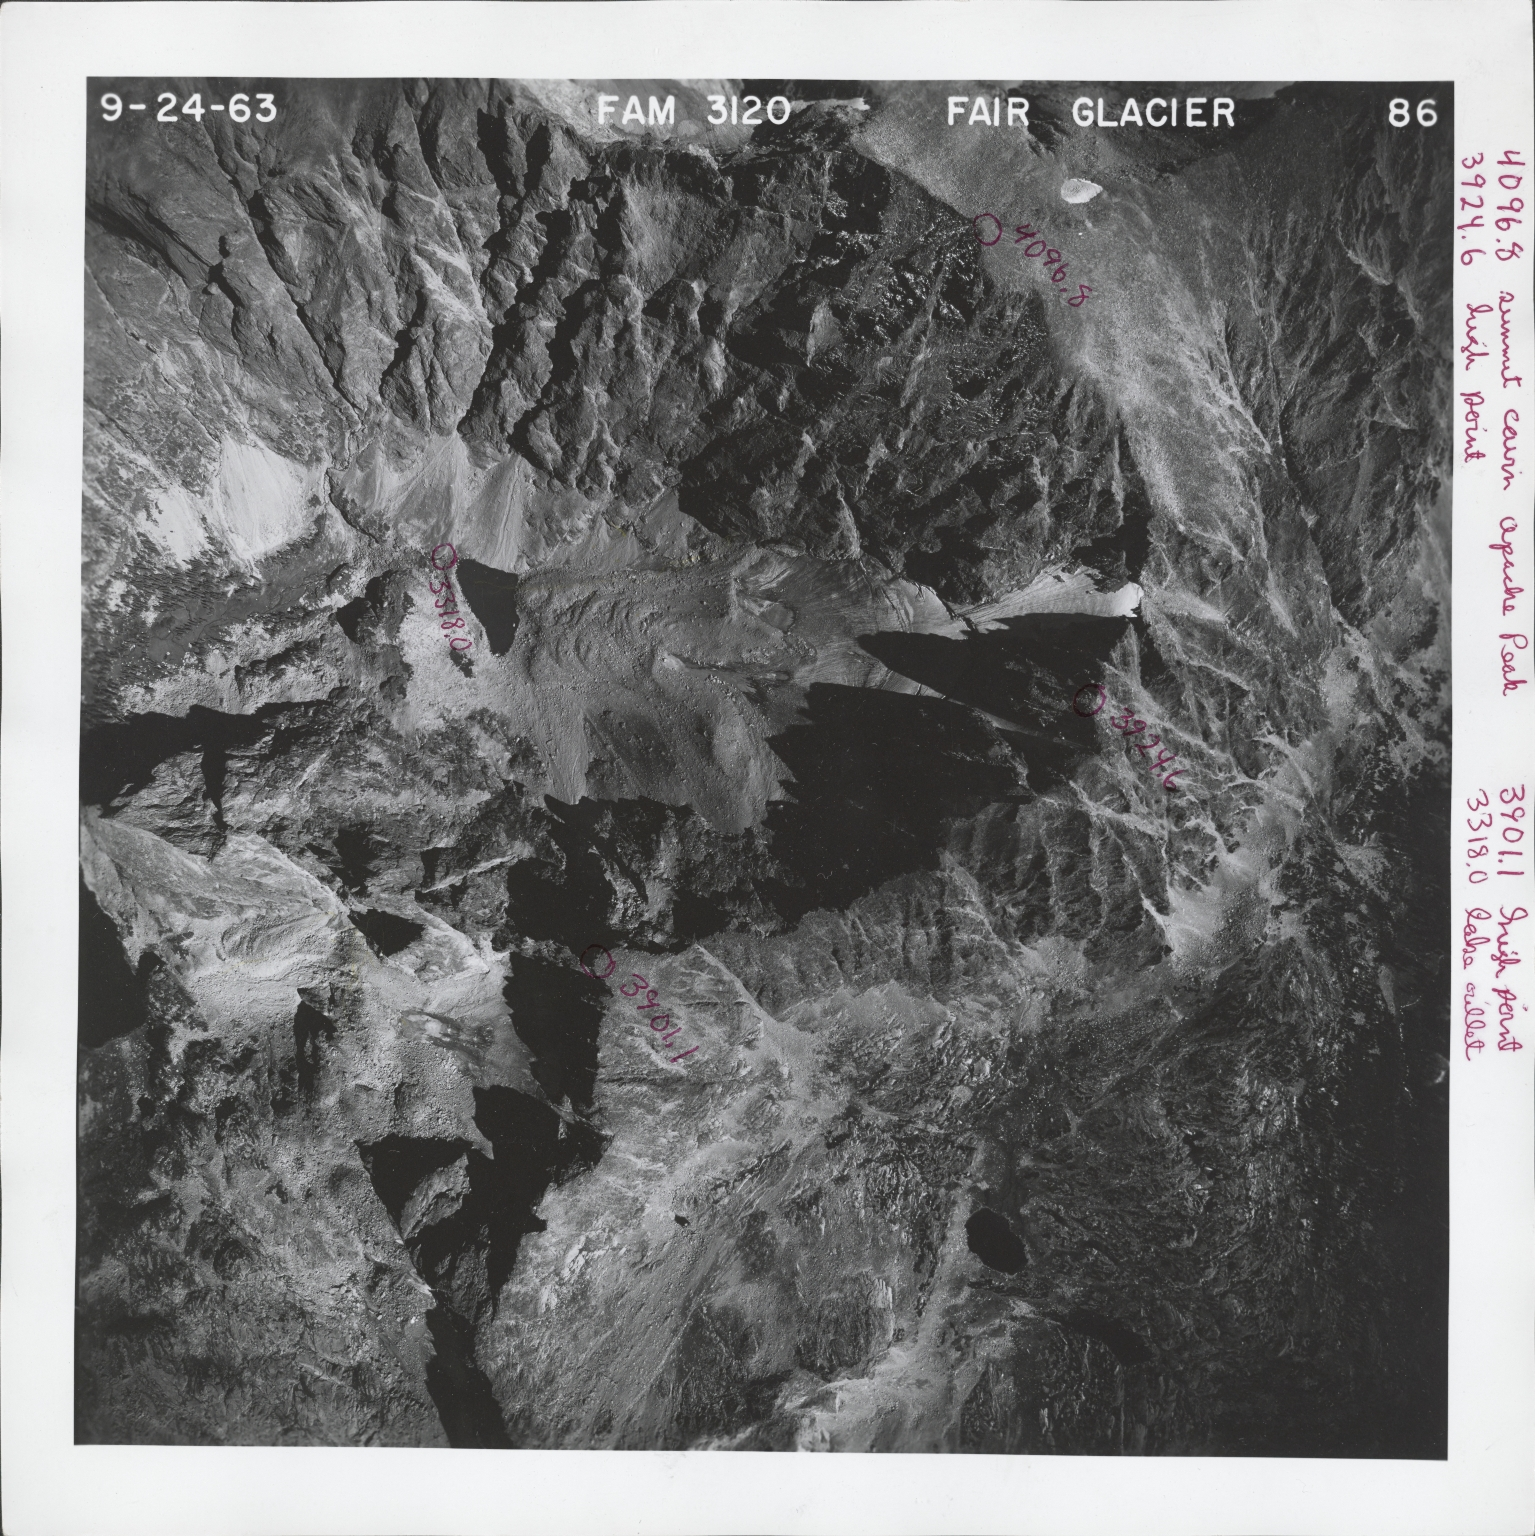 Fair Glacier, aerial photograph FAM 3120 86, Colorado